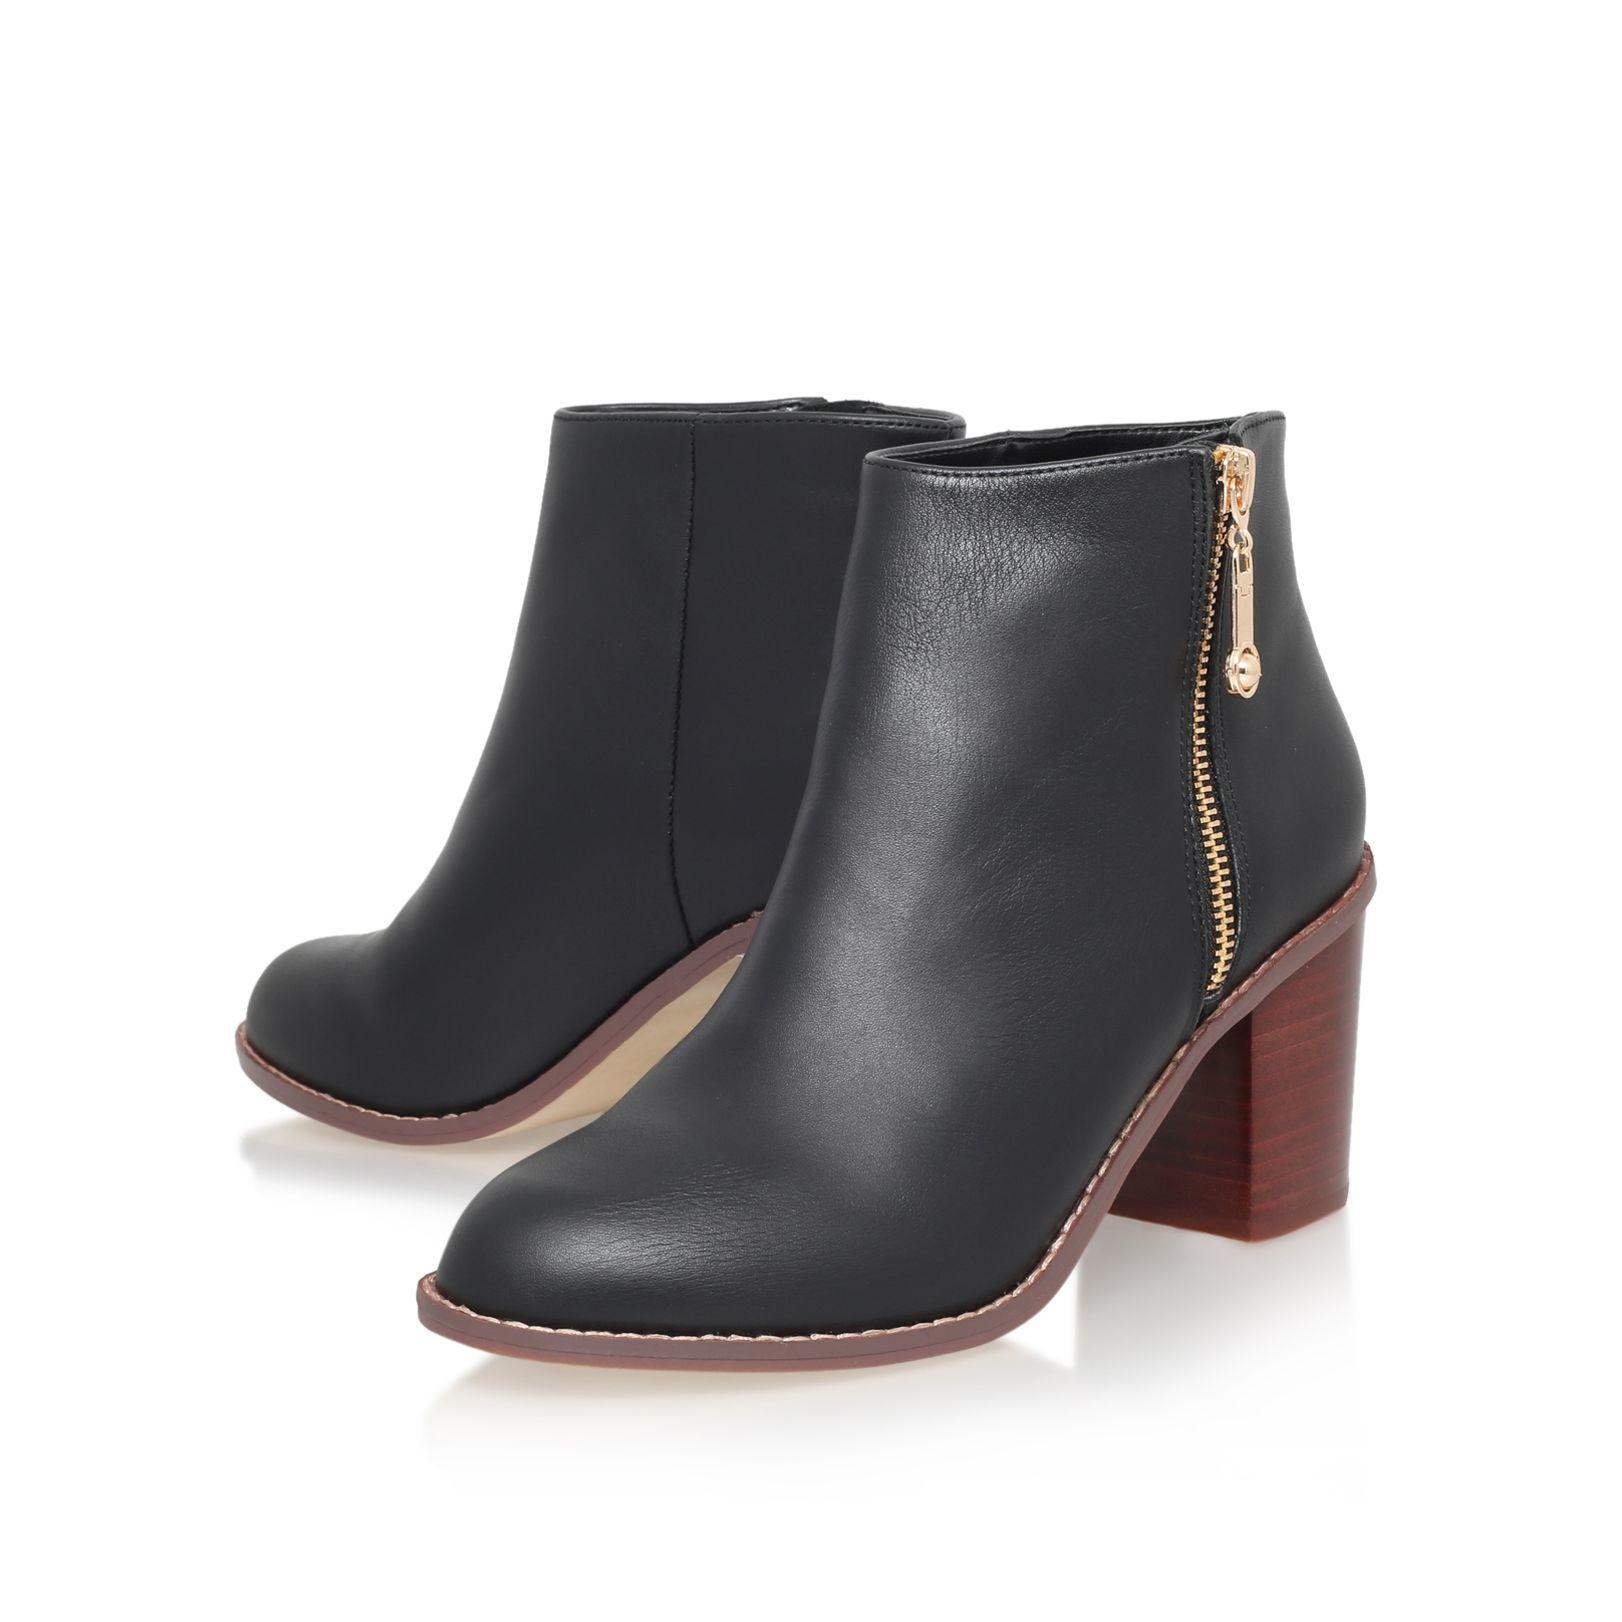 carvela kurt geiger tag mid block heel ankle boots in